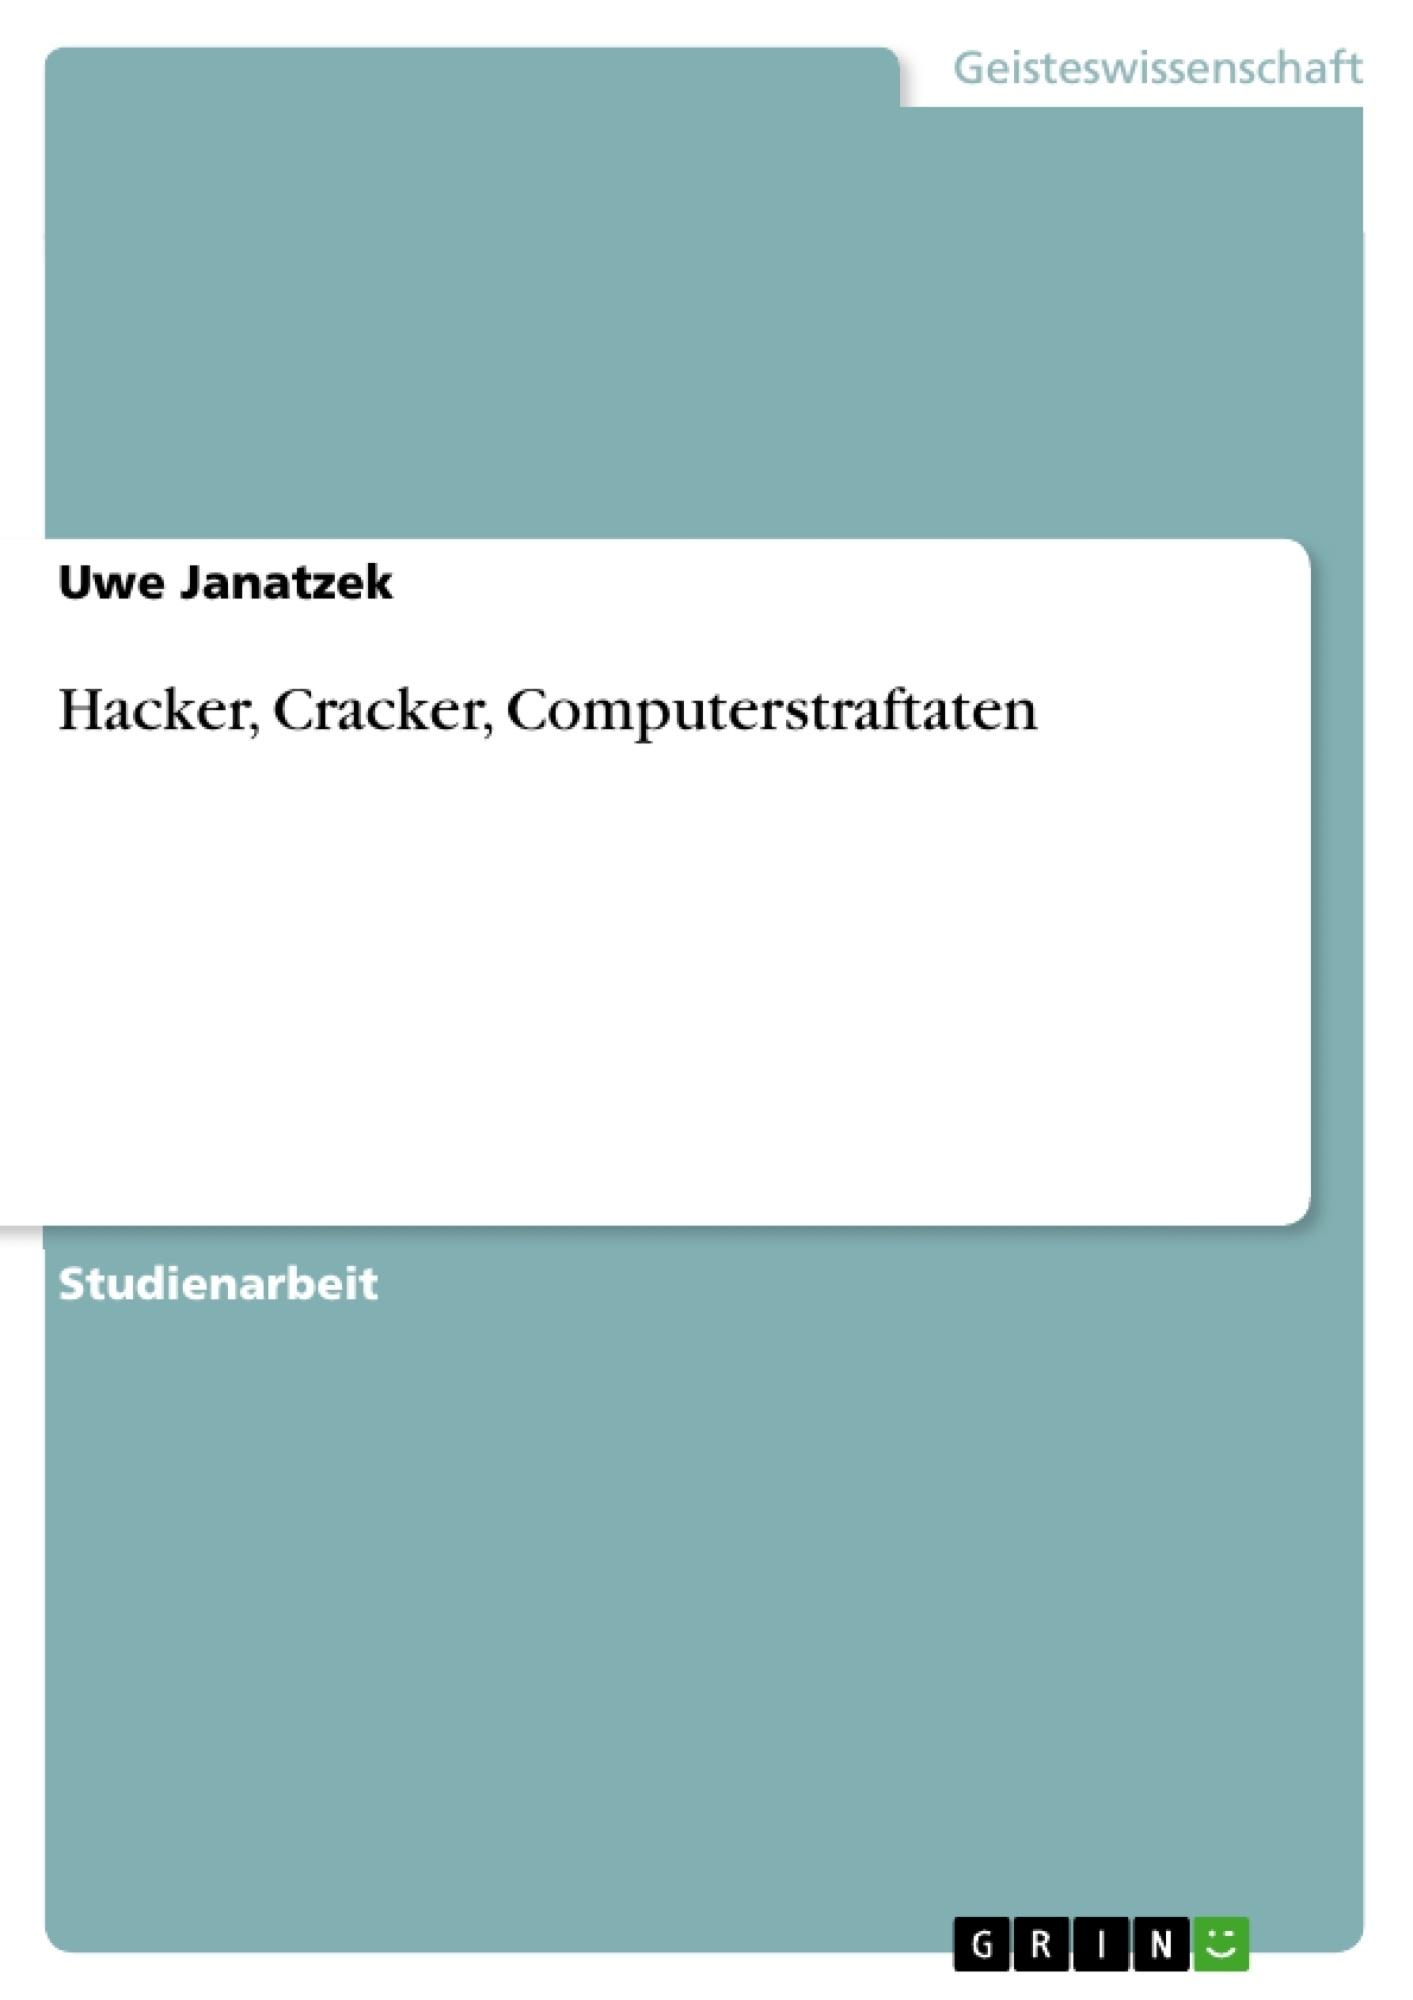 Titel: Hacker, Cracker, Computerstraftaten